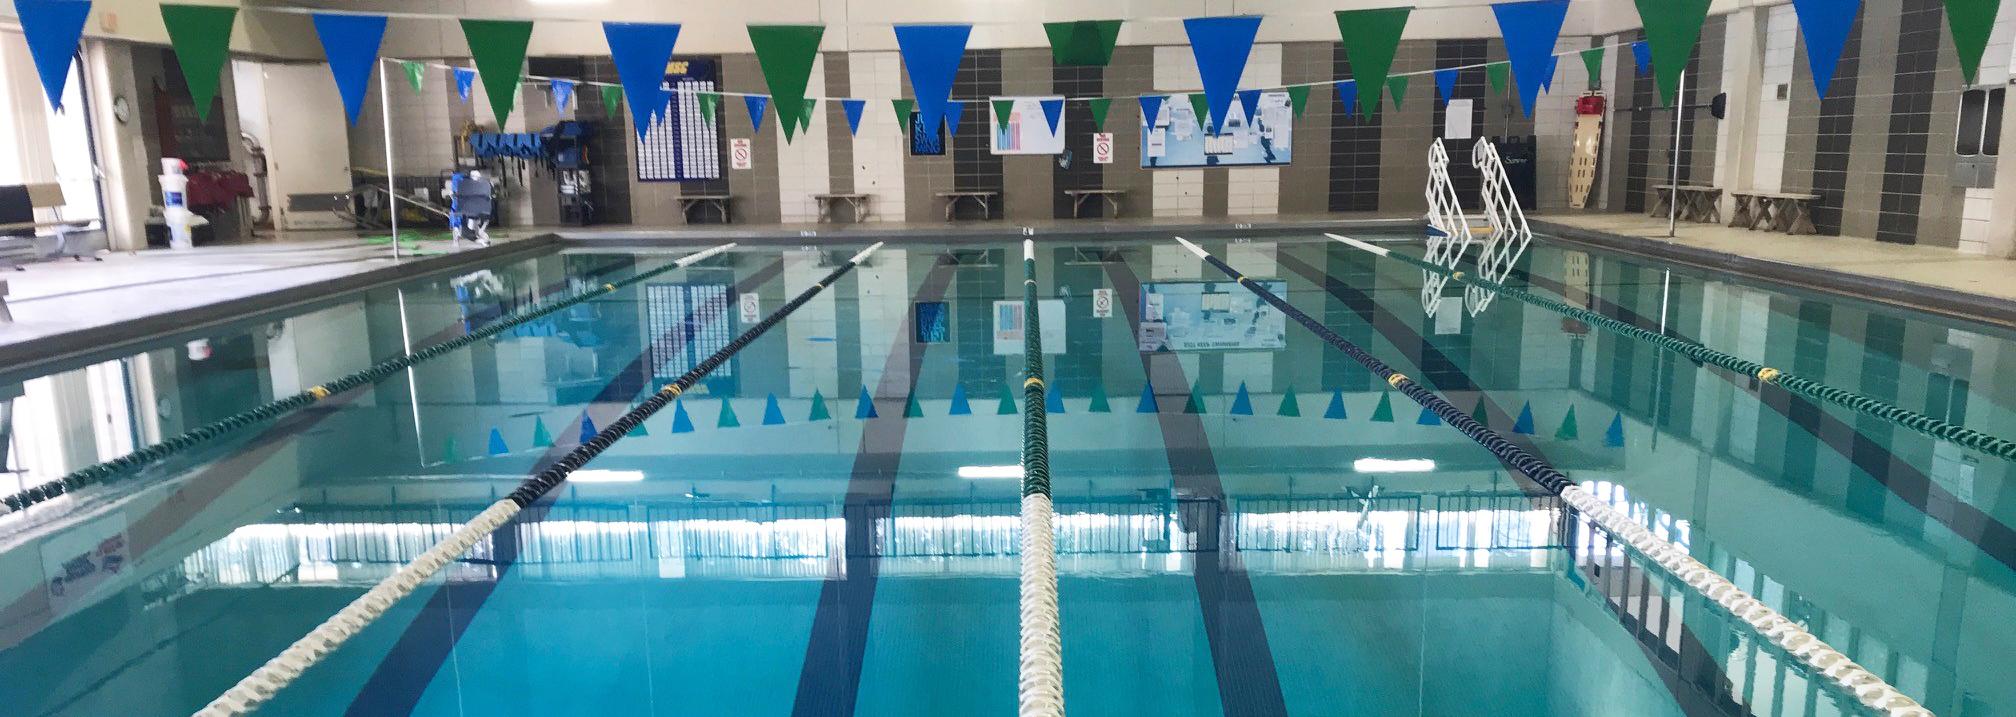 pool photo xlarge